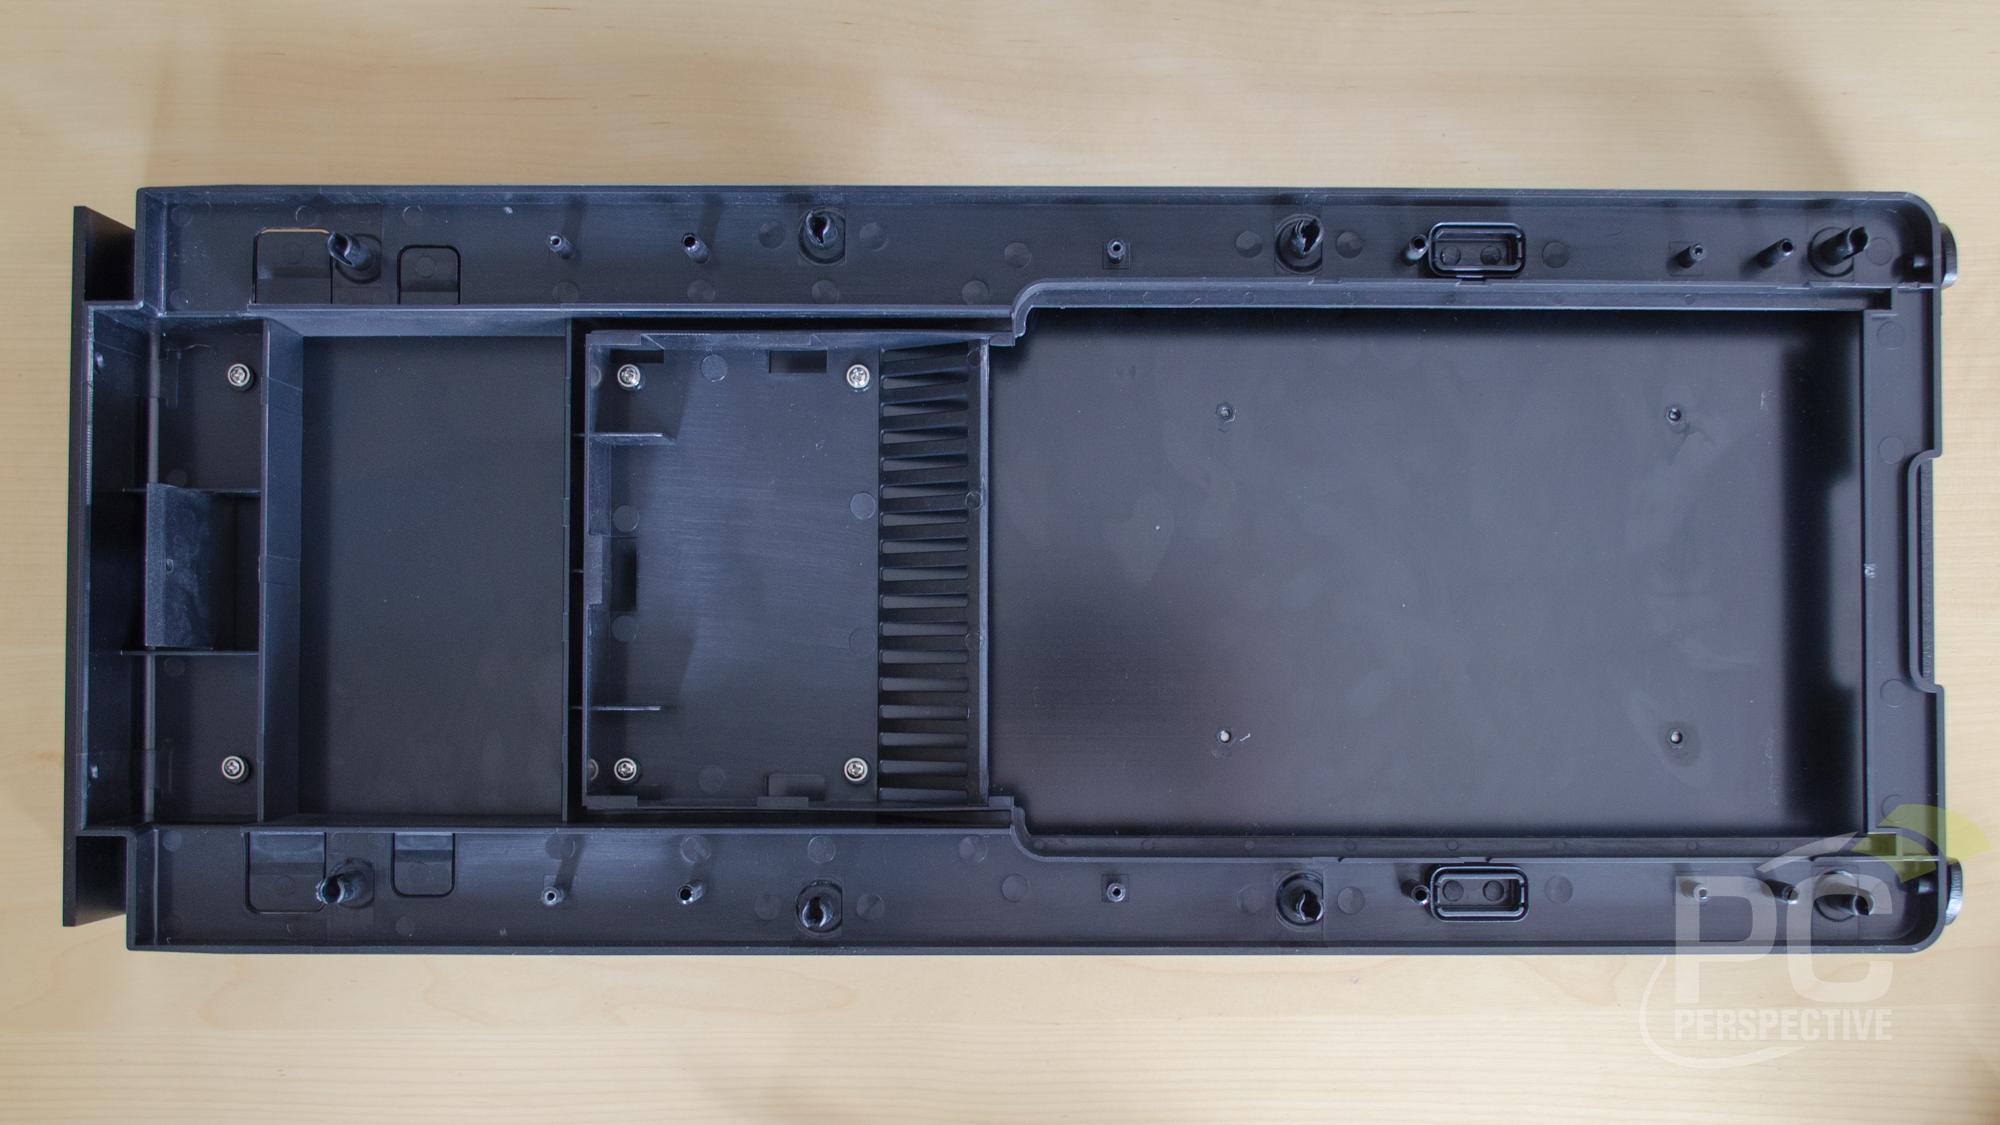 dsc-0090-2.jpg